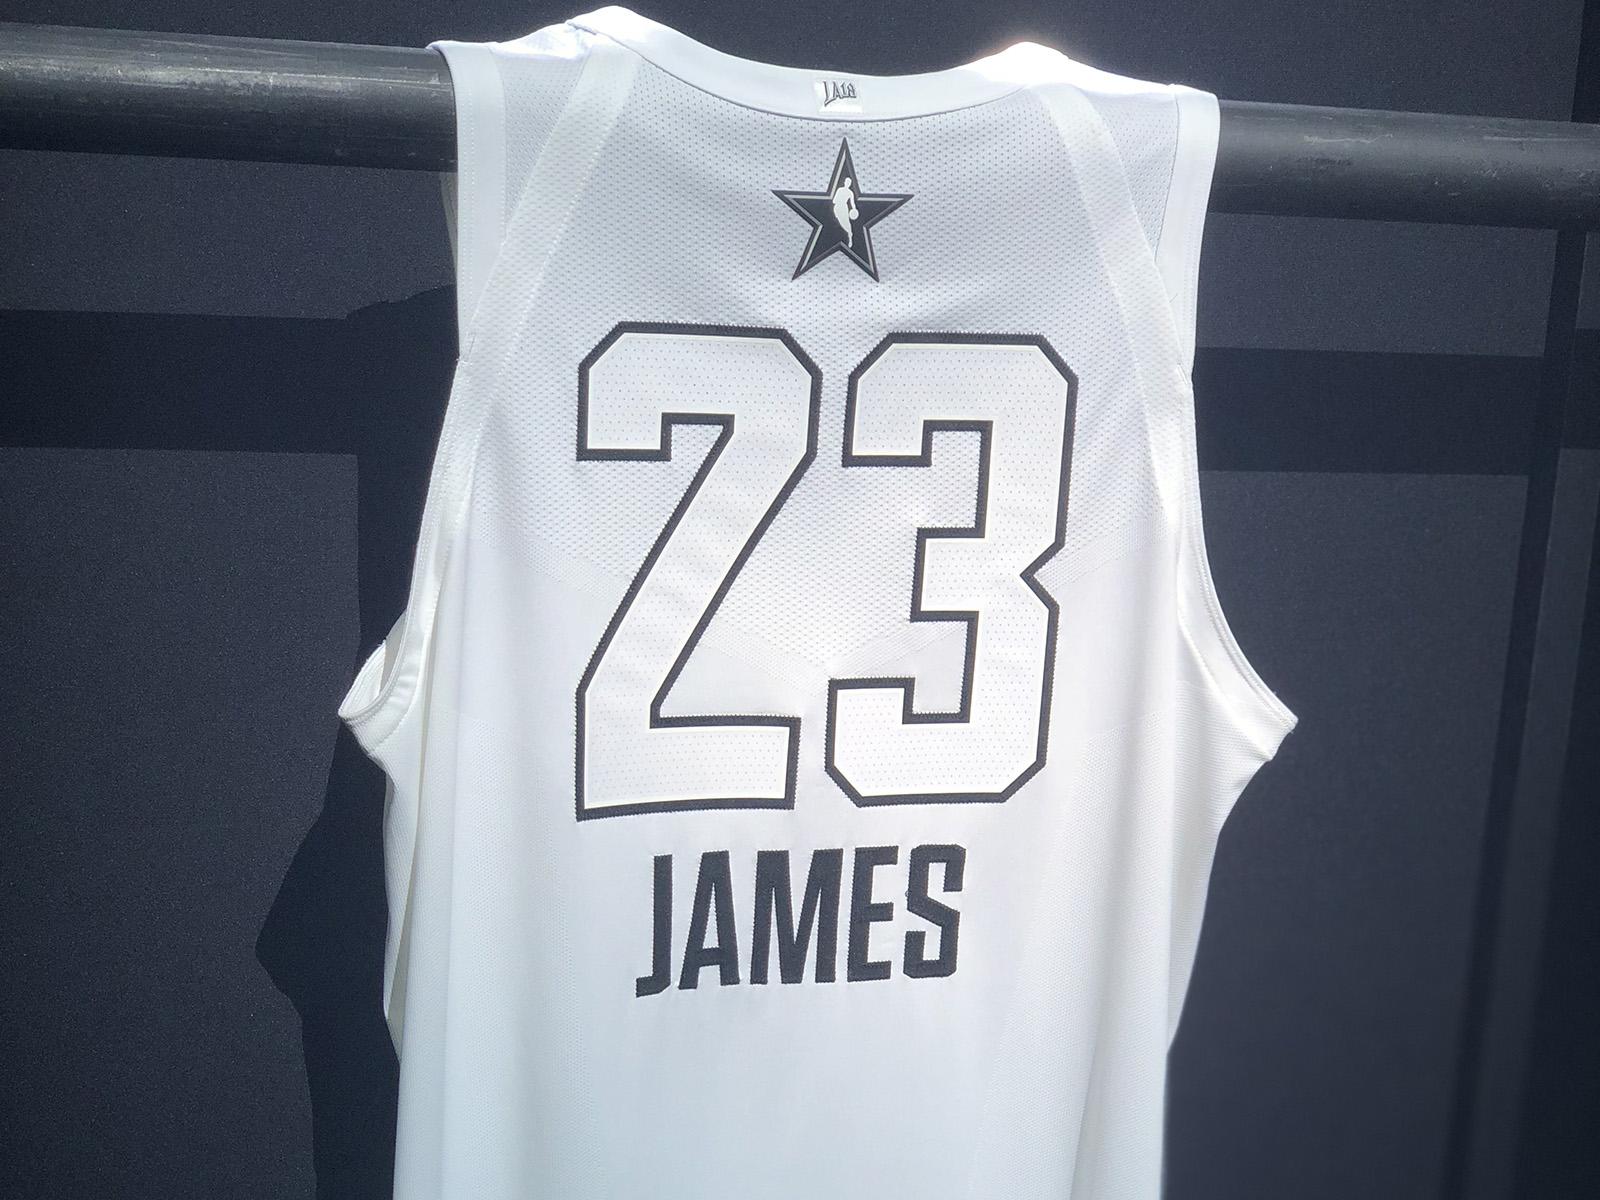 NBA All-Star Jerseys  Jordan Execs Defend Black-and-White Design ... 876e6fbcb